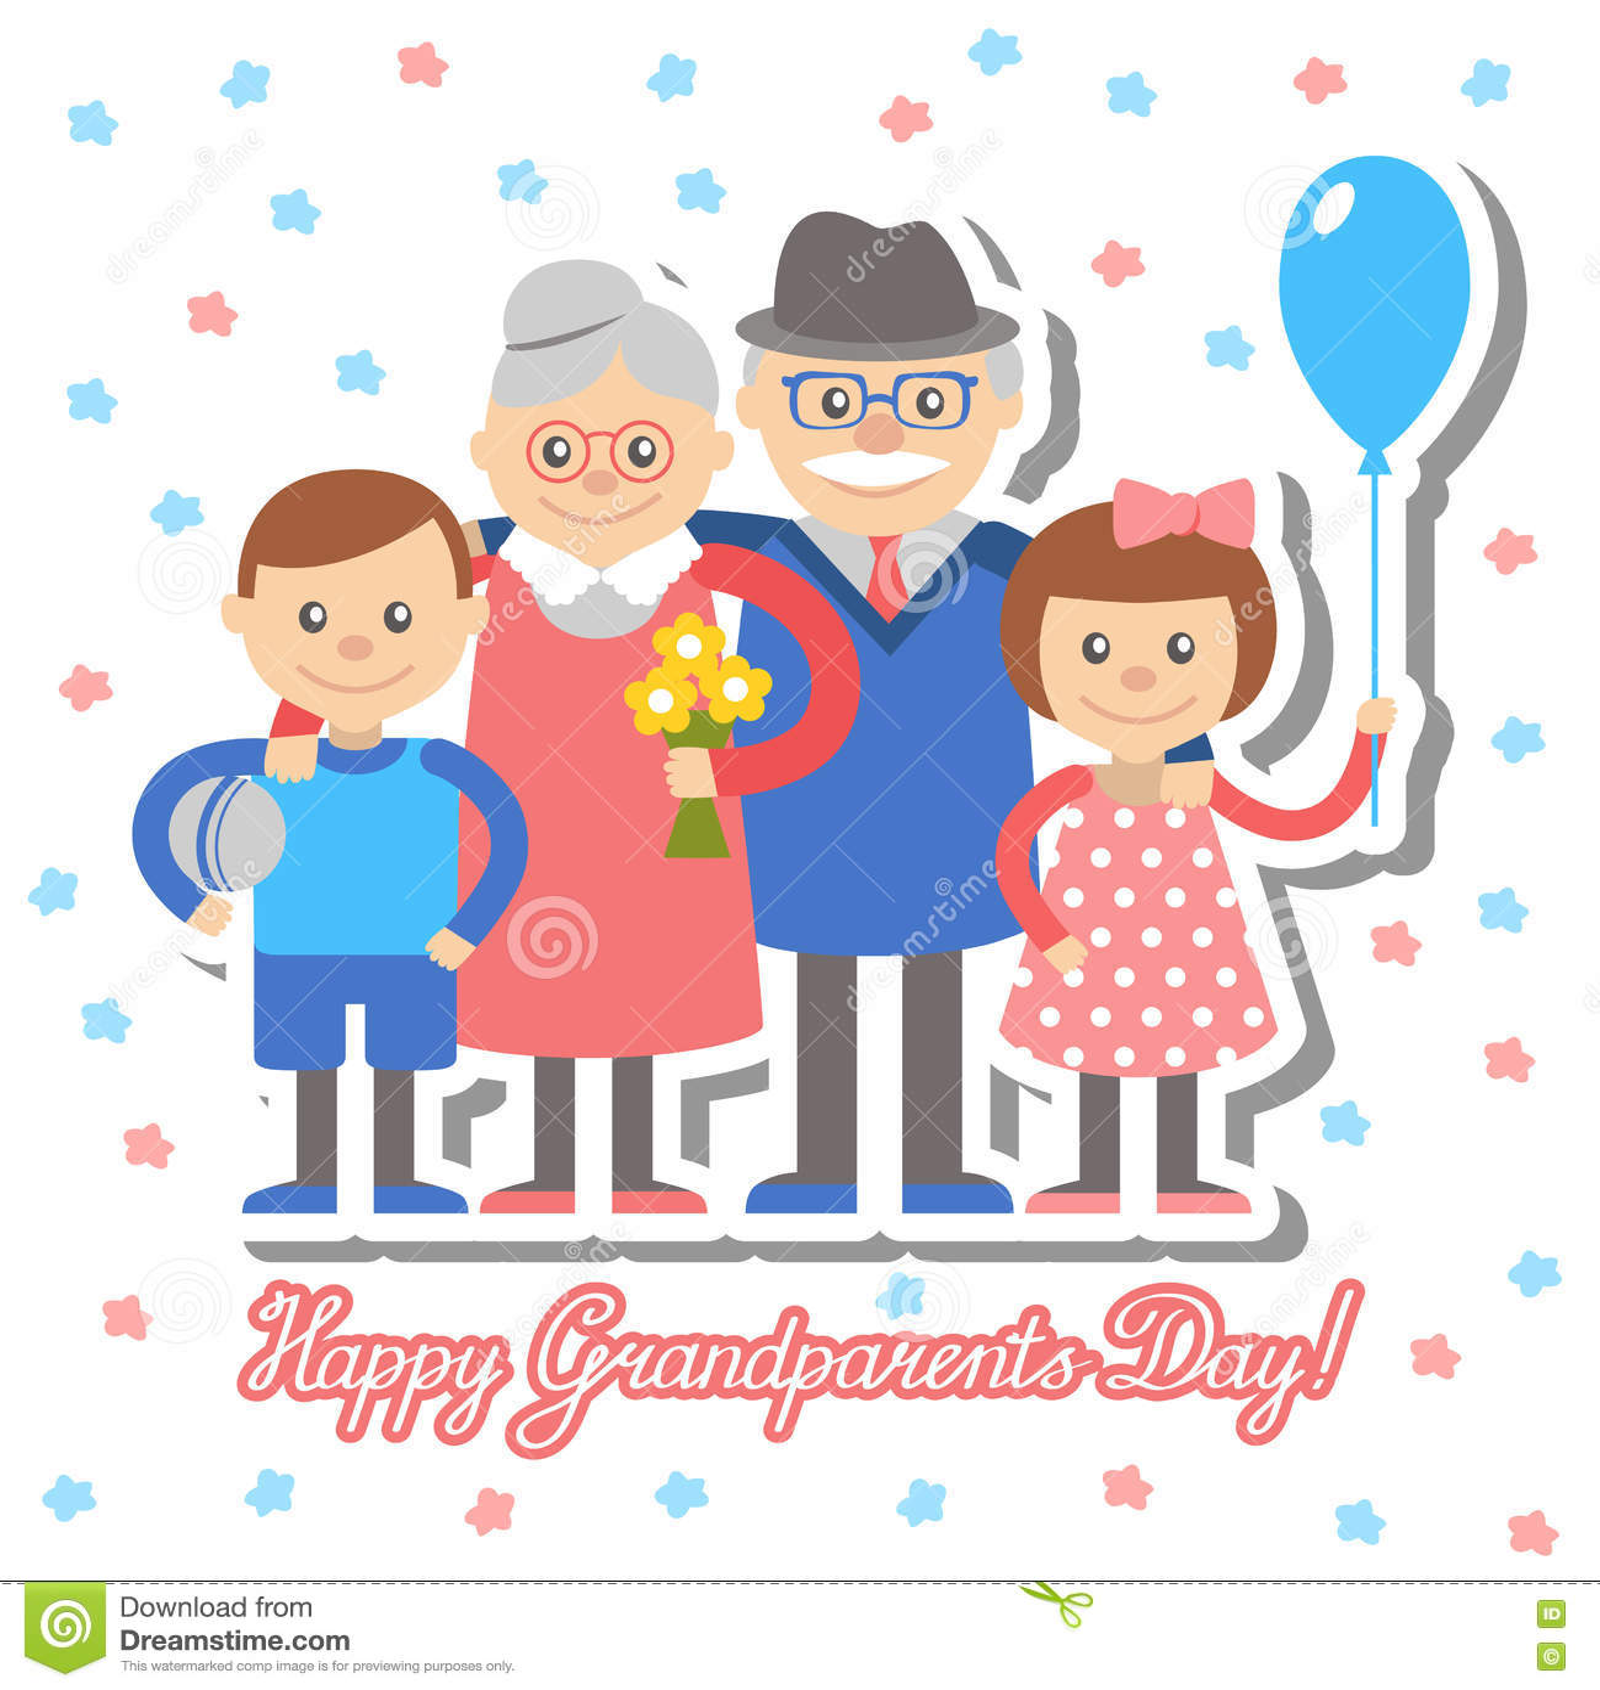 Grandmother and grandfather grandchildren greeting card for download grandmother and grandfather grandchildren greeting card for grandparents day vector illustration stock vector m4hsunfo